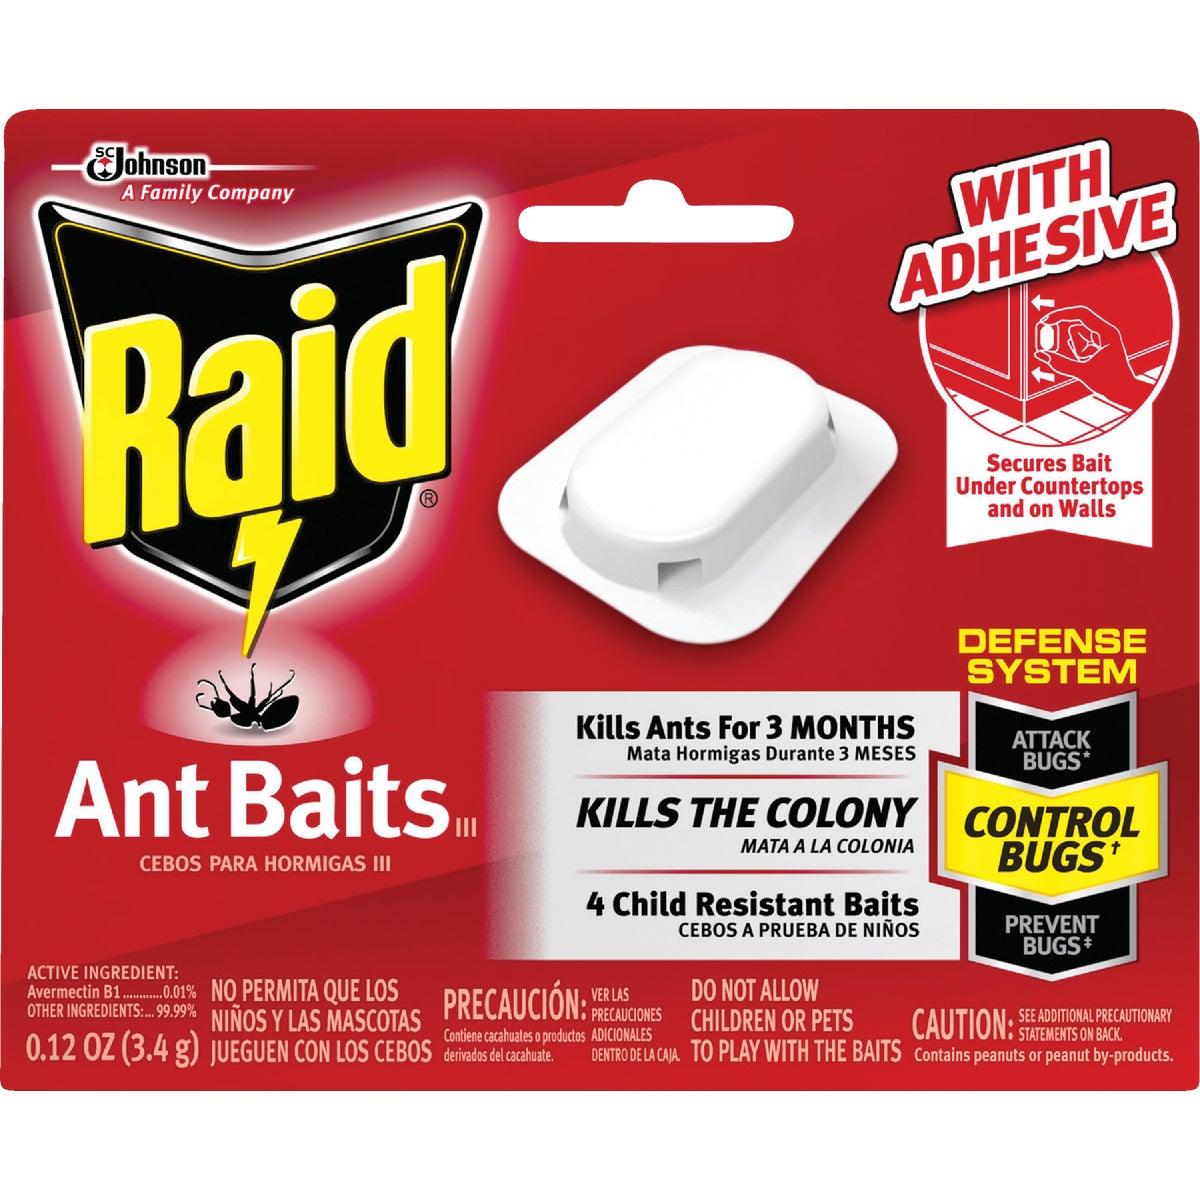 4 ANT BAITS - 71478 by Sc Johnson